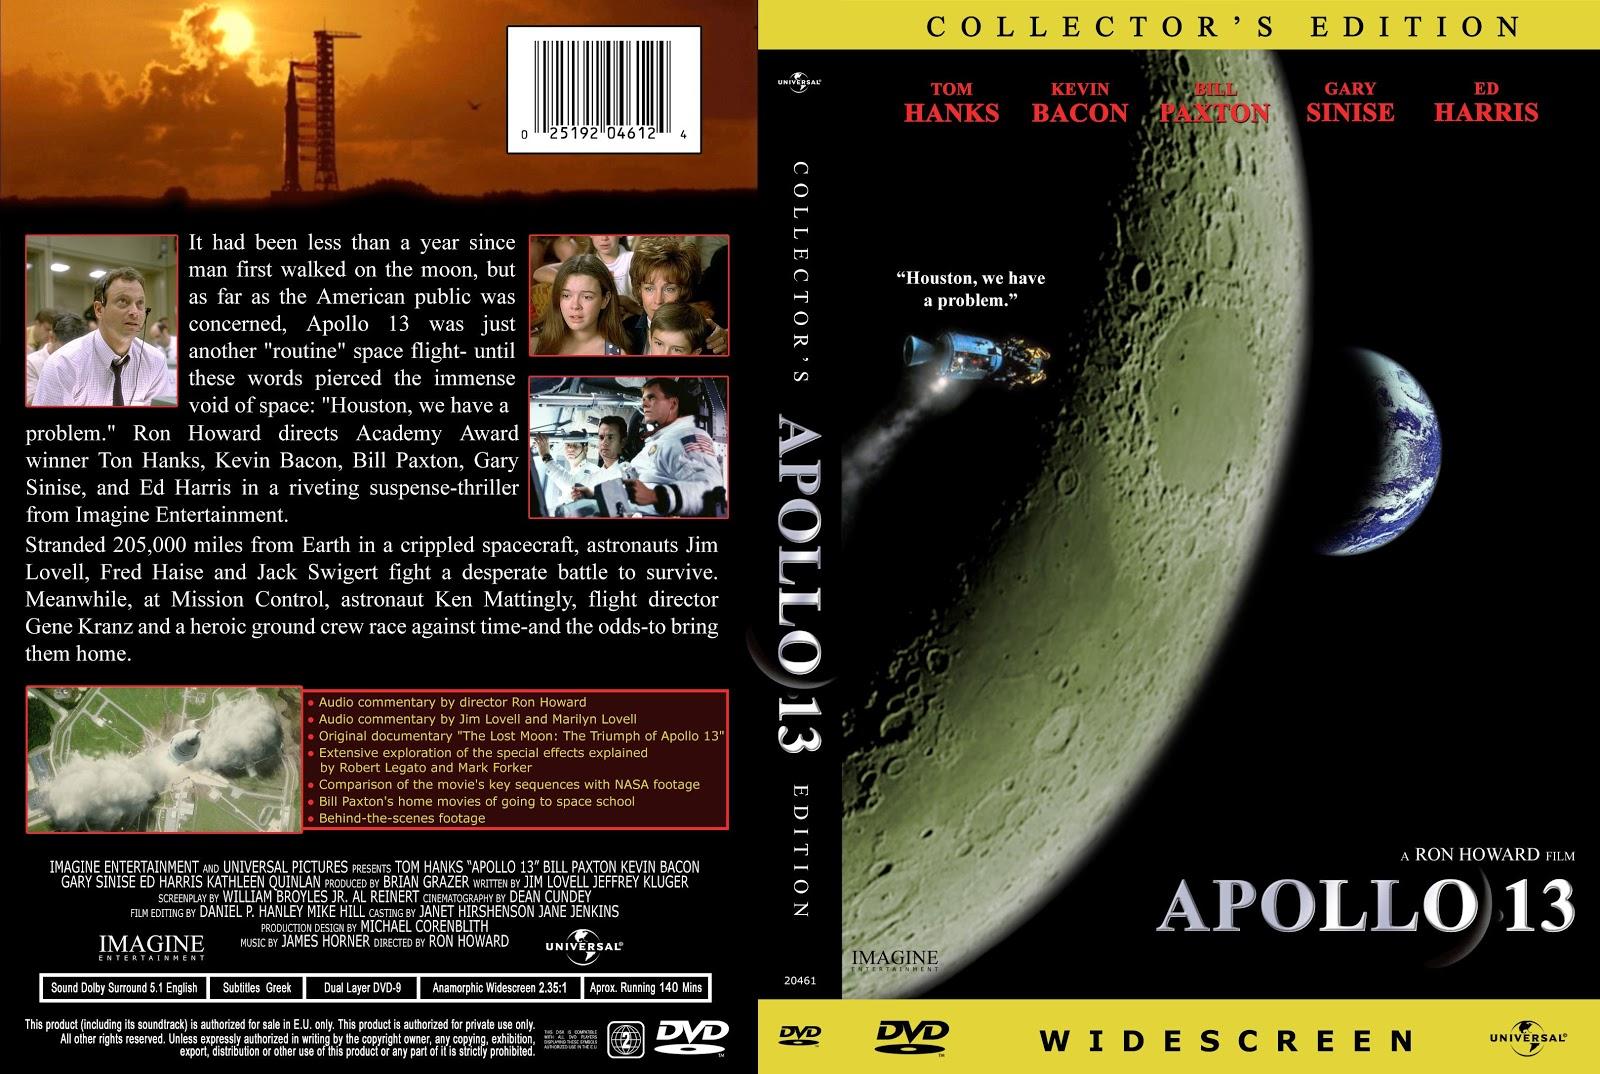 Capa DVD Apollo 13 Collectors Edition